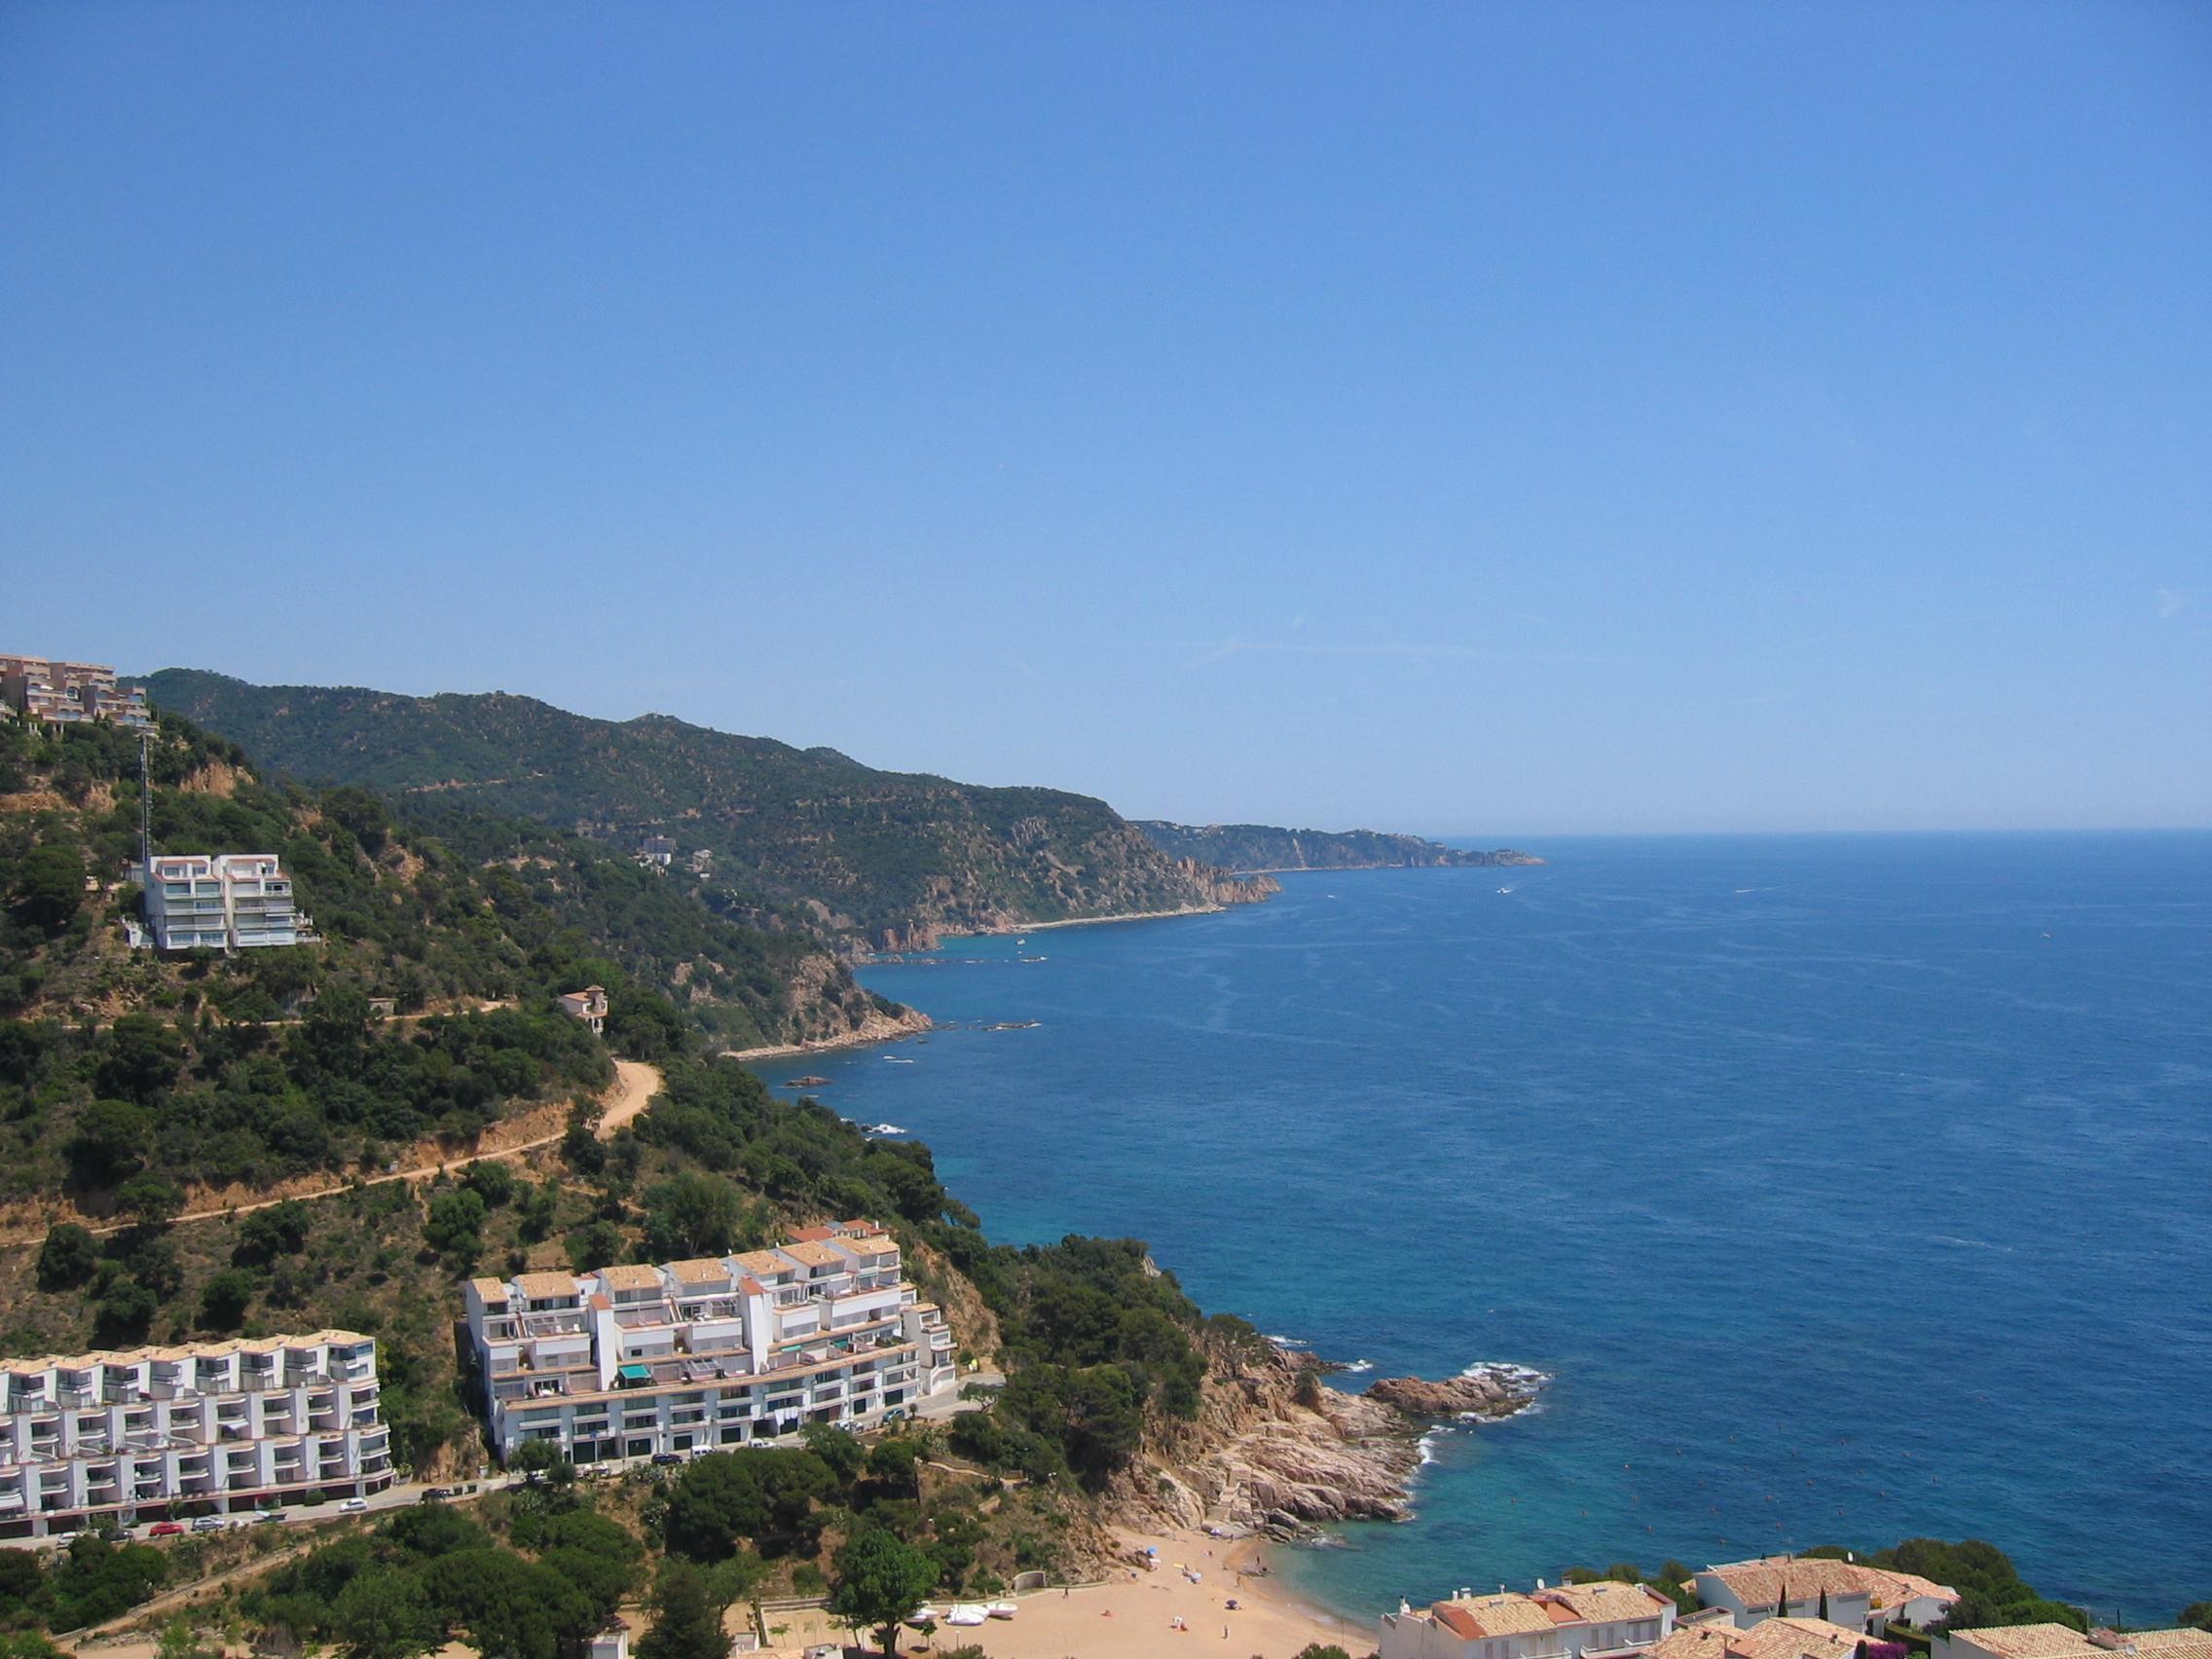 Playa Cala Salions